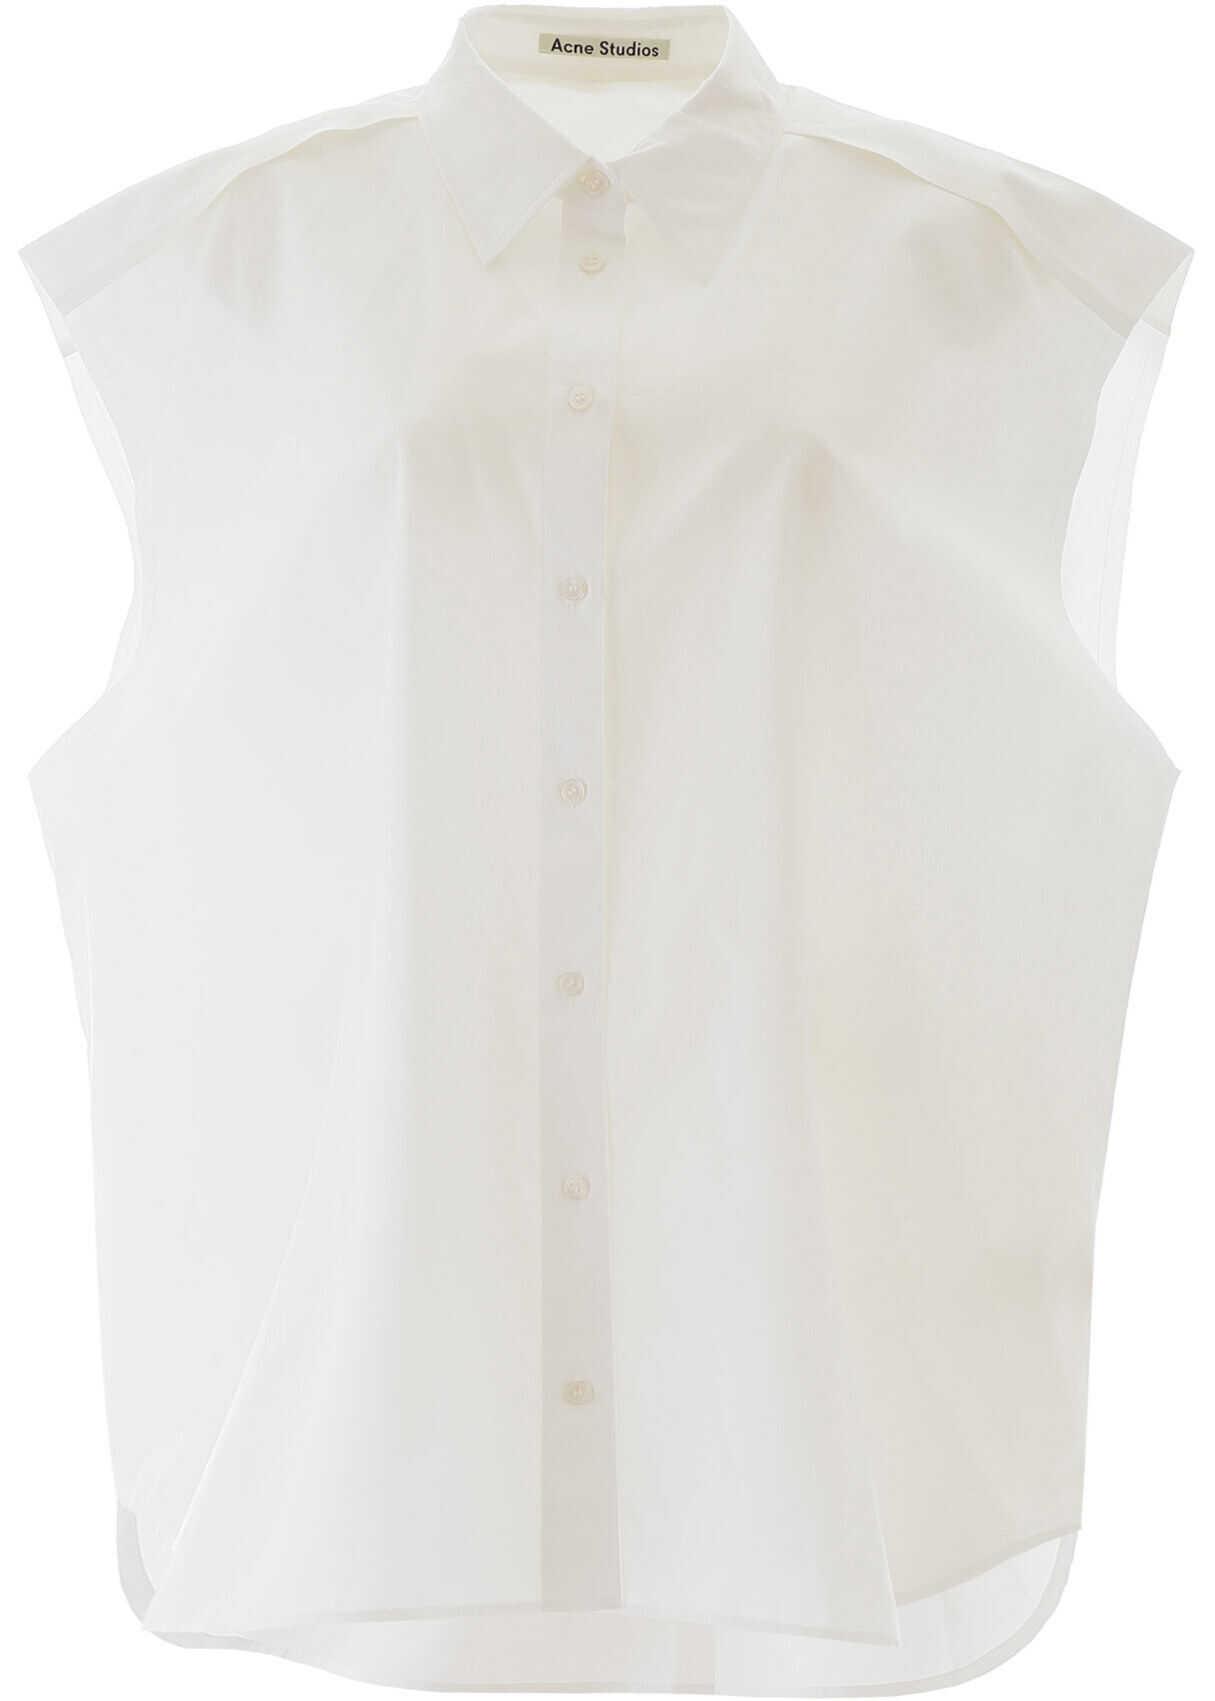 Acne Studios Oversized Shirt WHITE